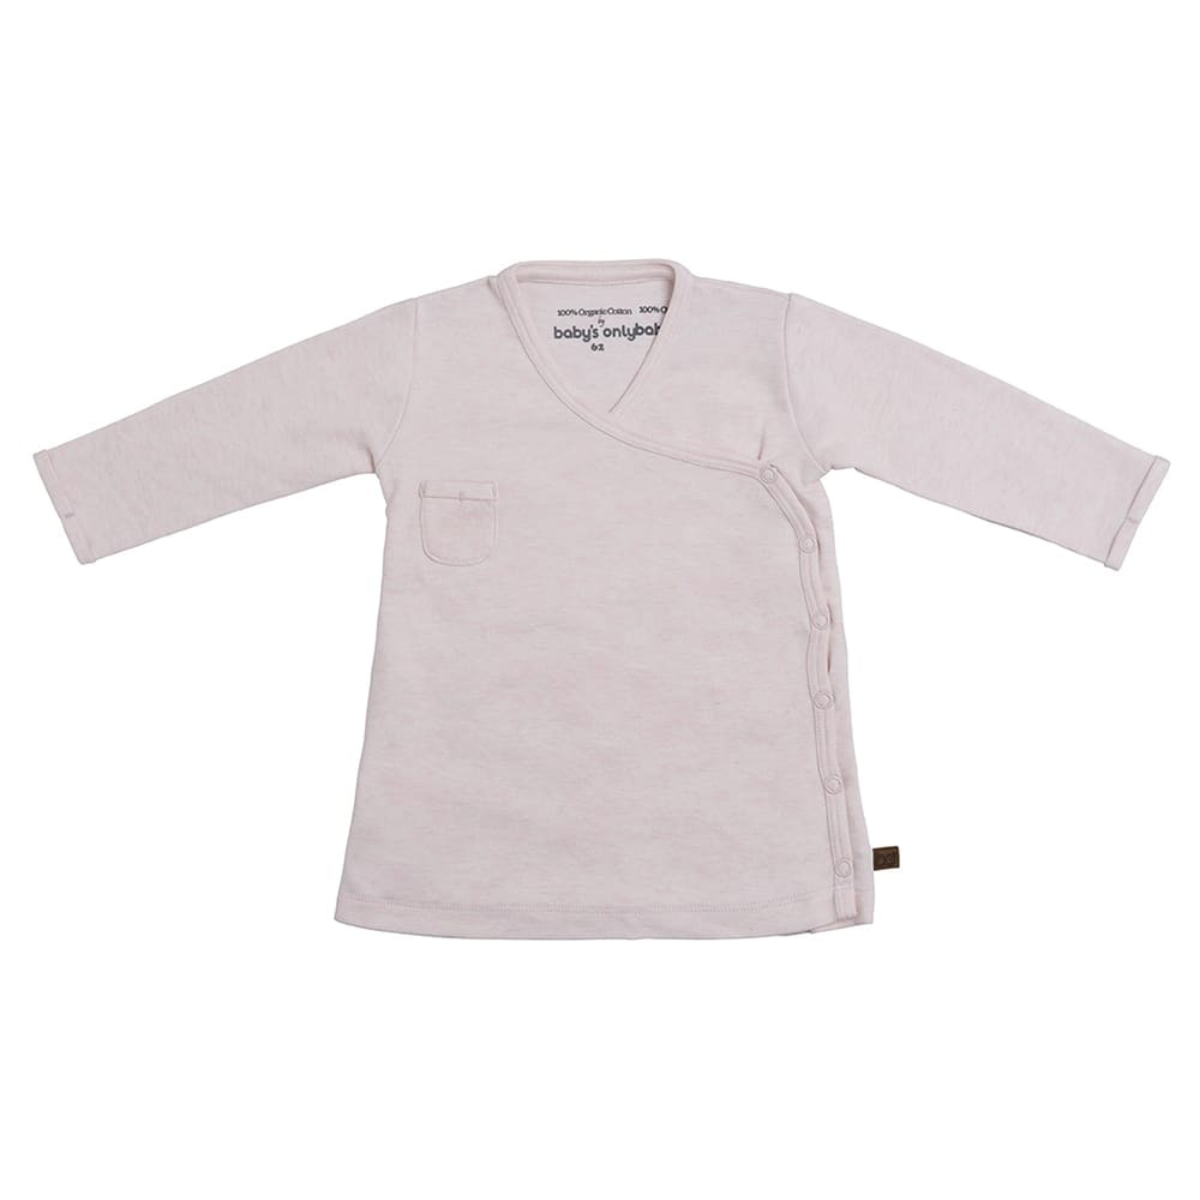 babys only 3506201 jurkje melange 62 classic roze 1